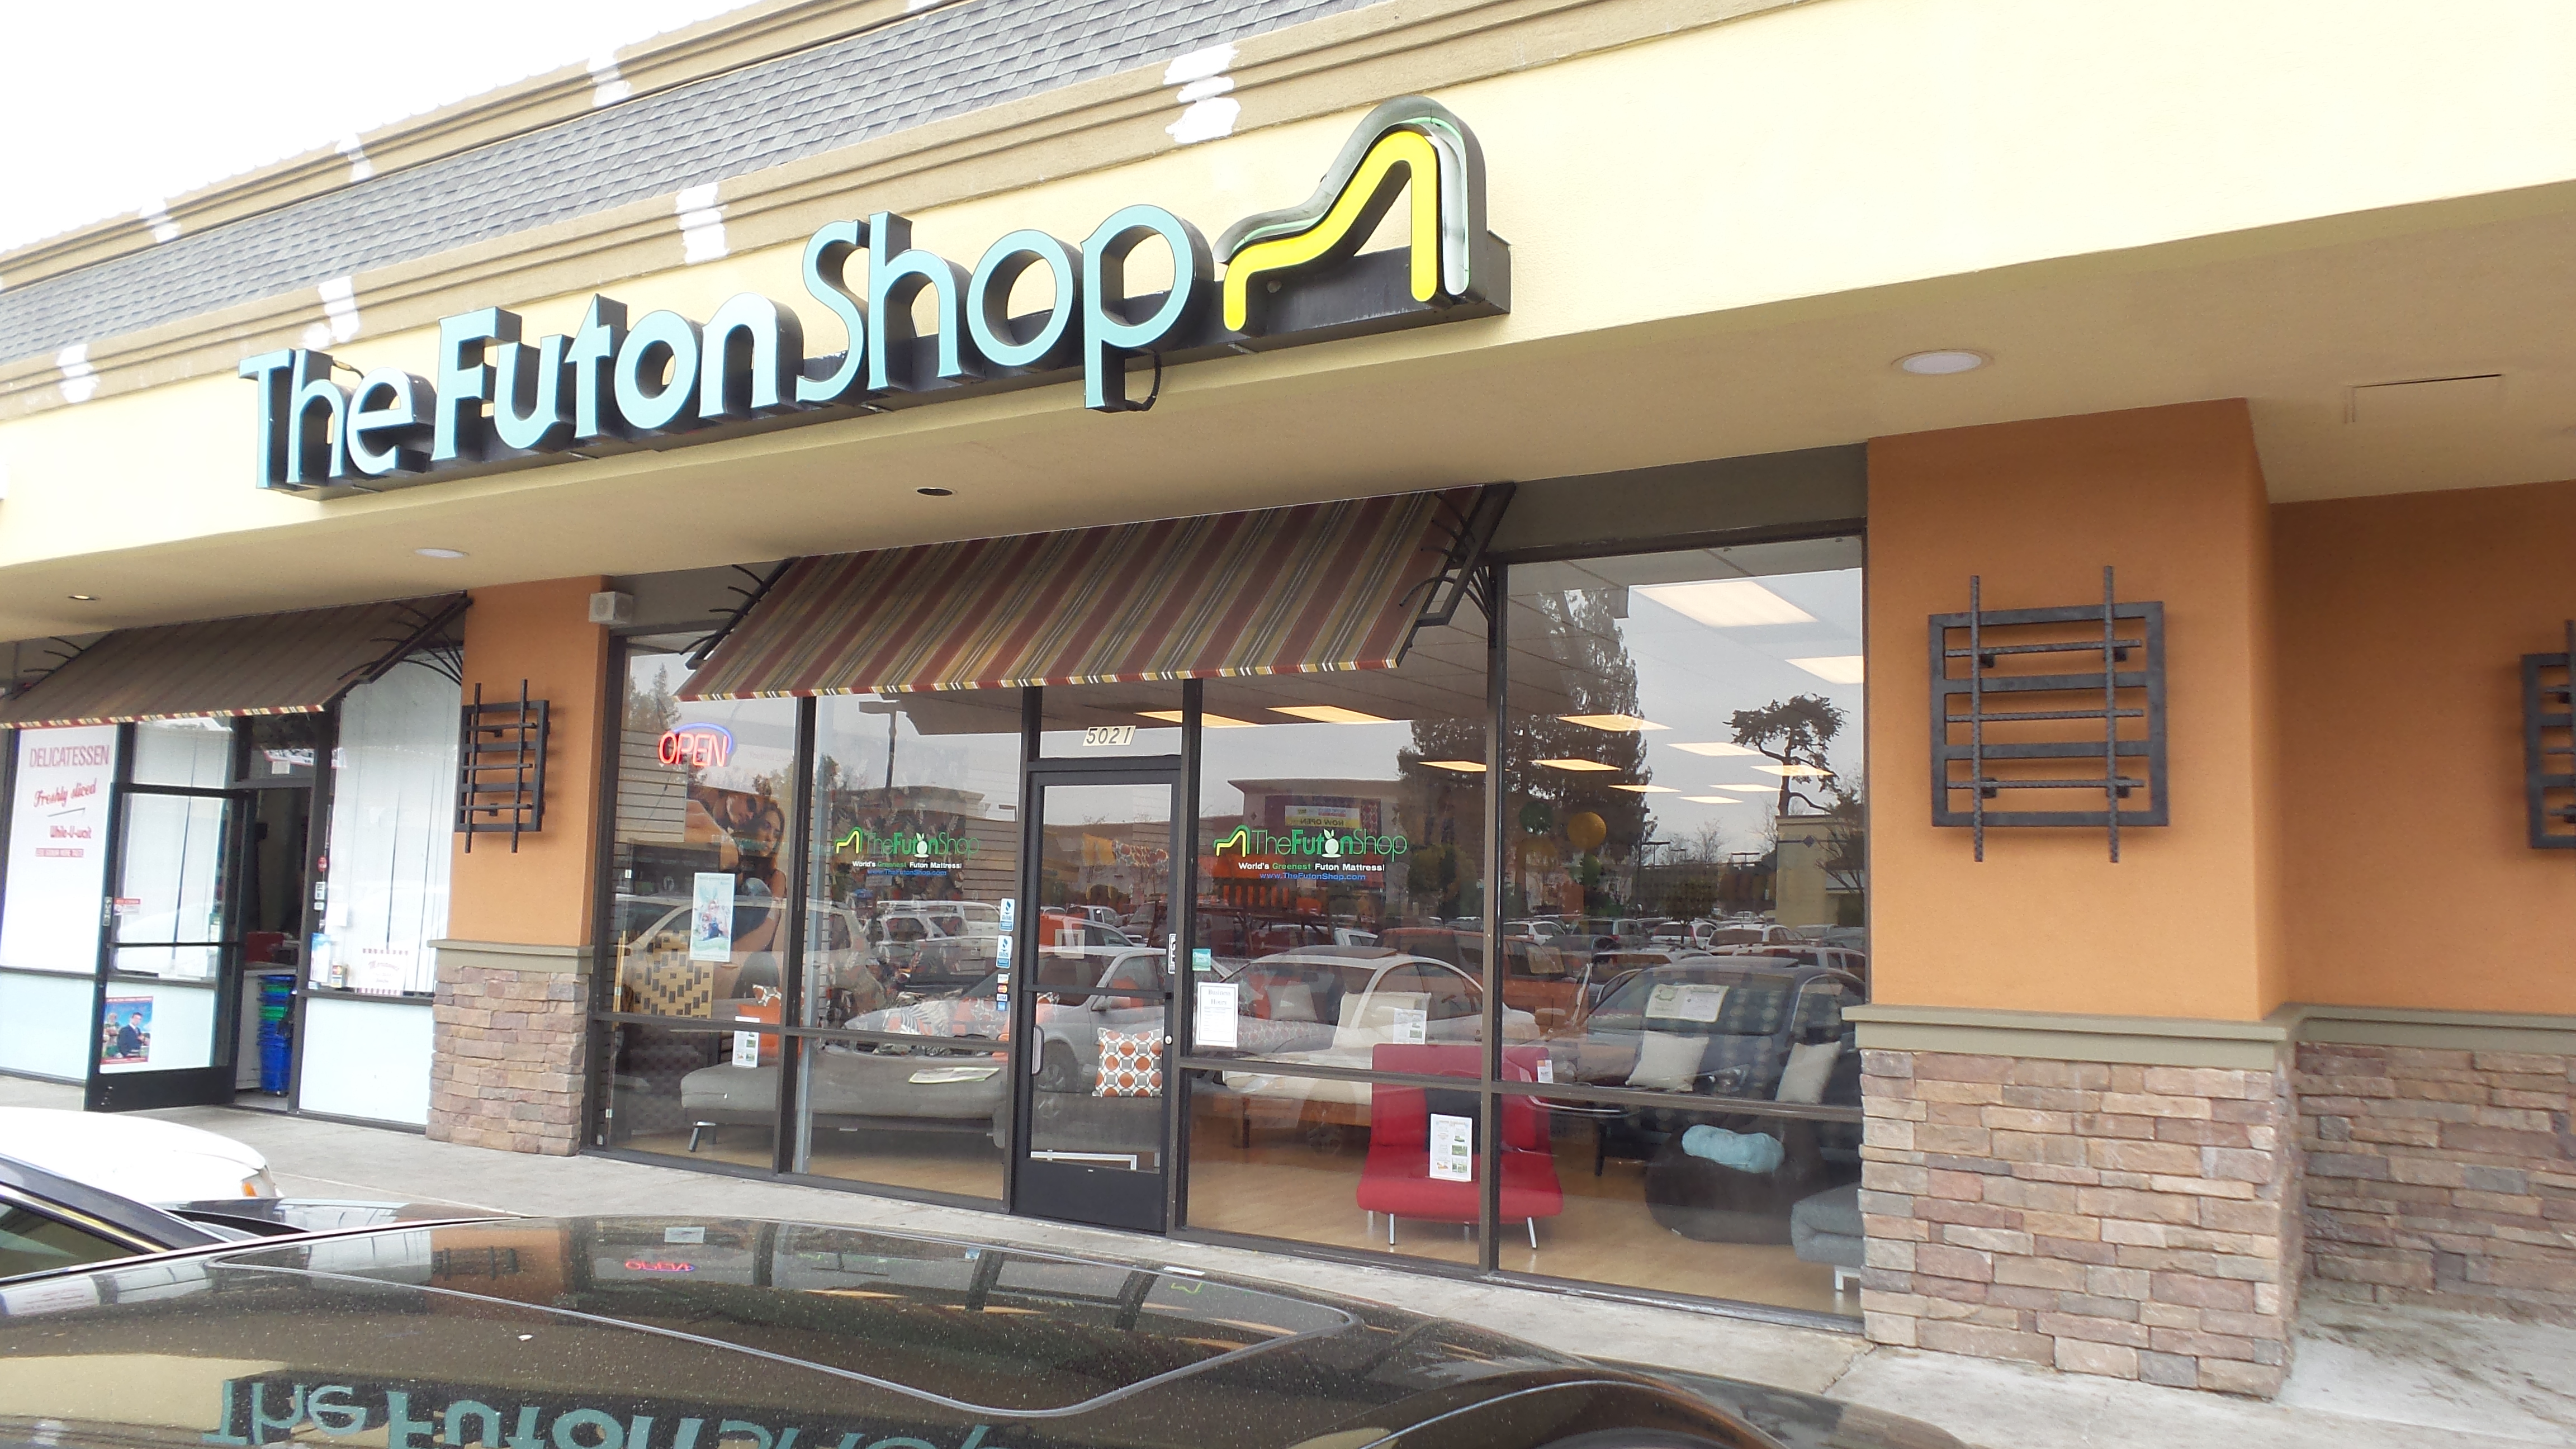 Visit The Futon Shop Locations in California!